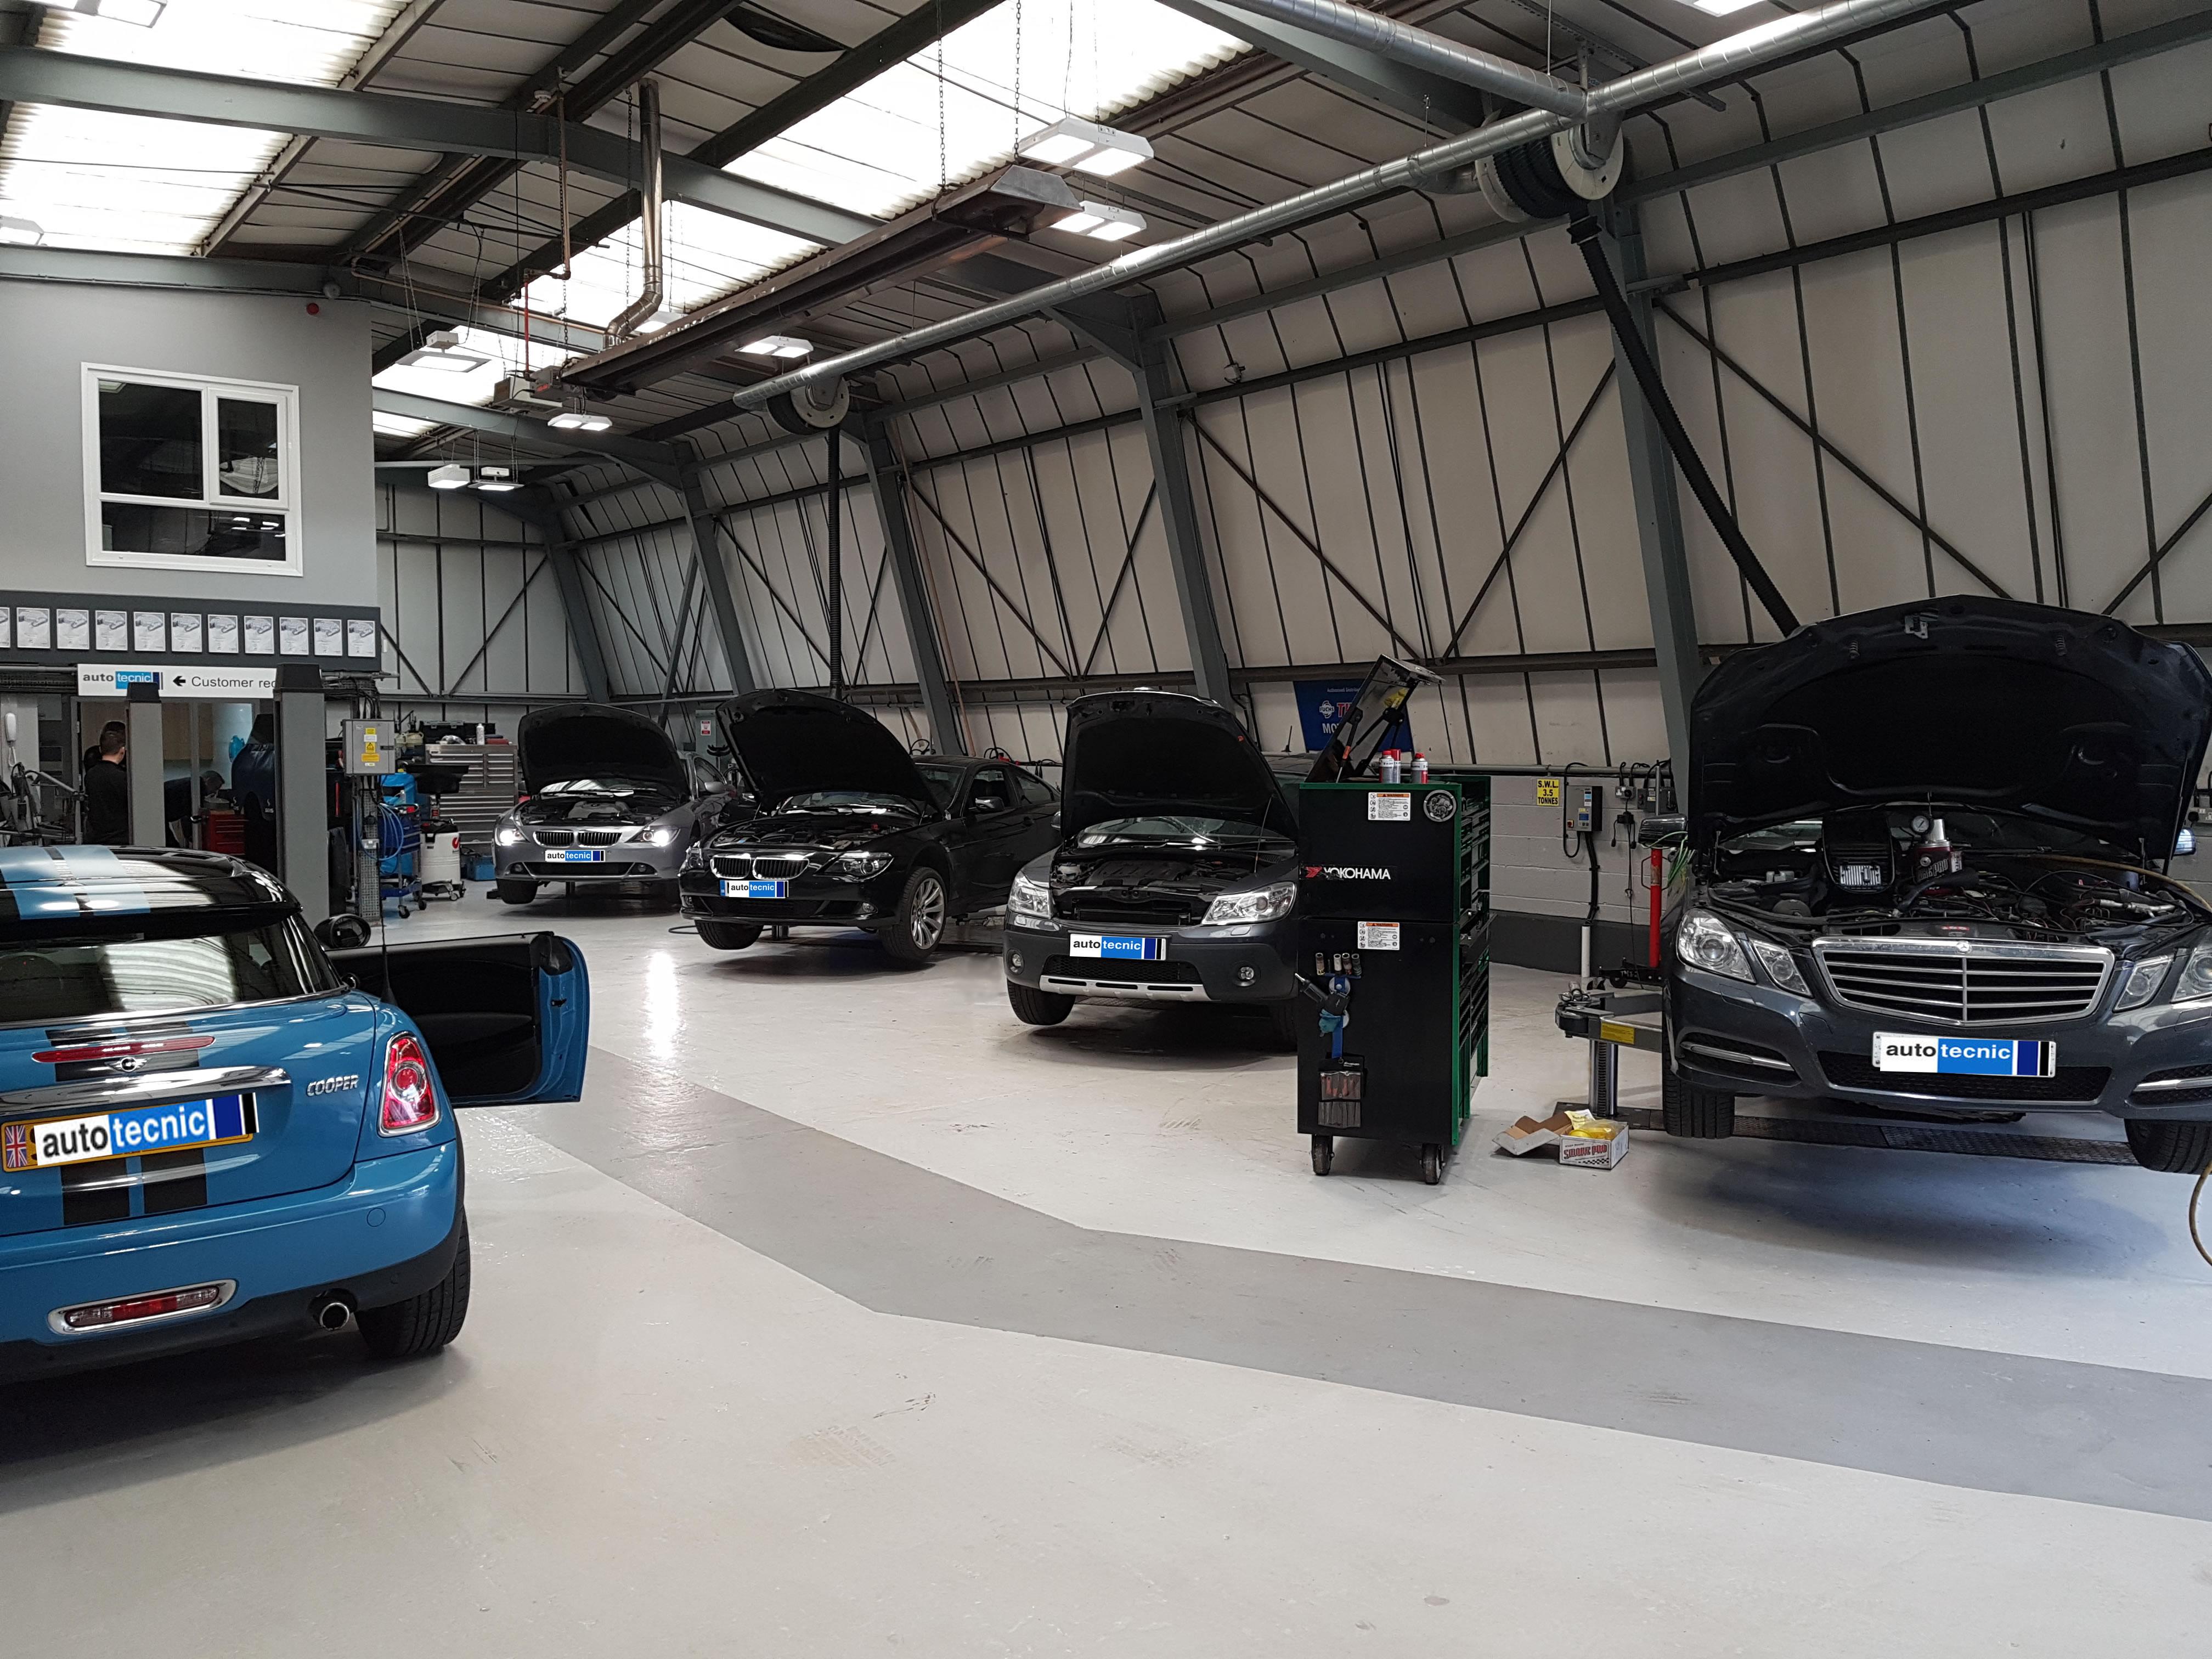 autotecnic - workshop - bmw - mercedes - mini